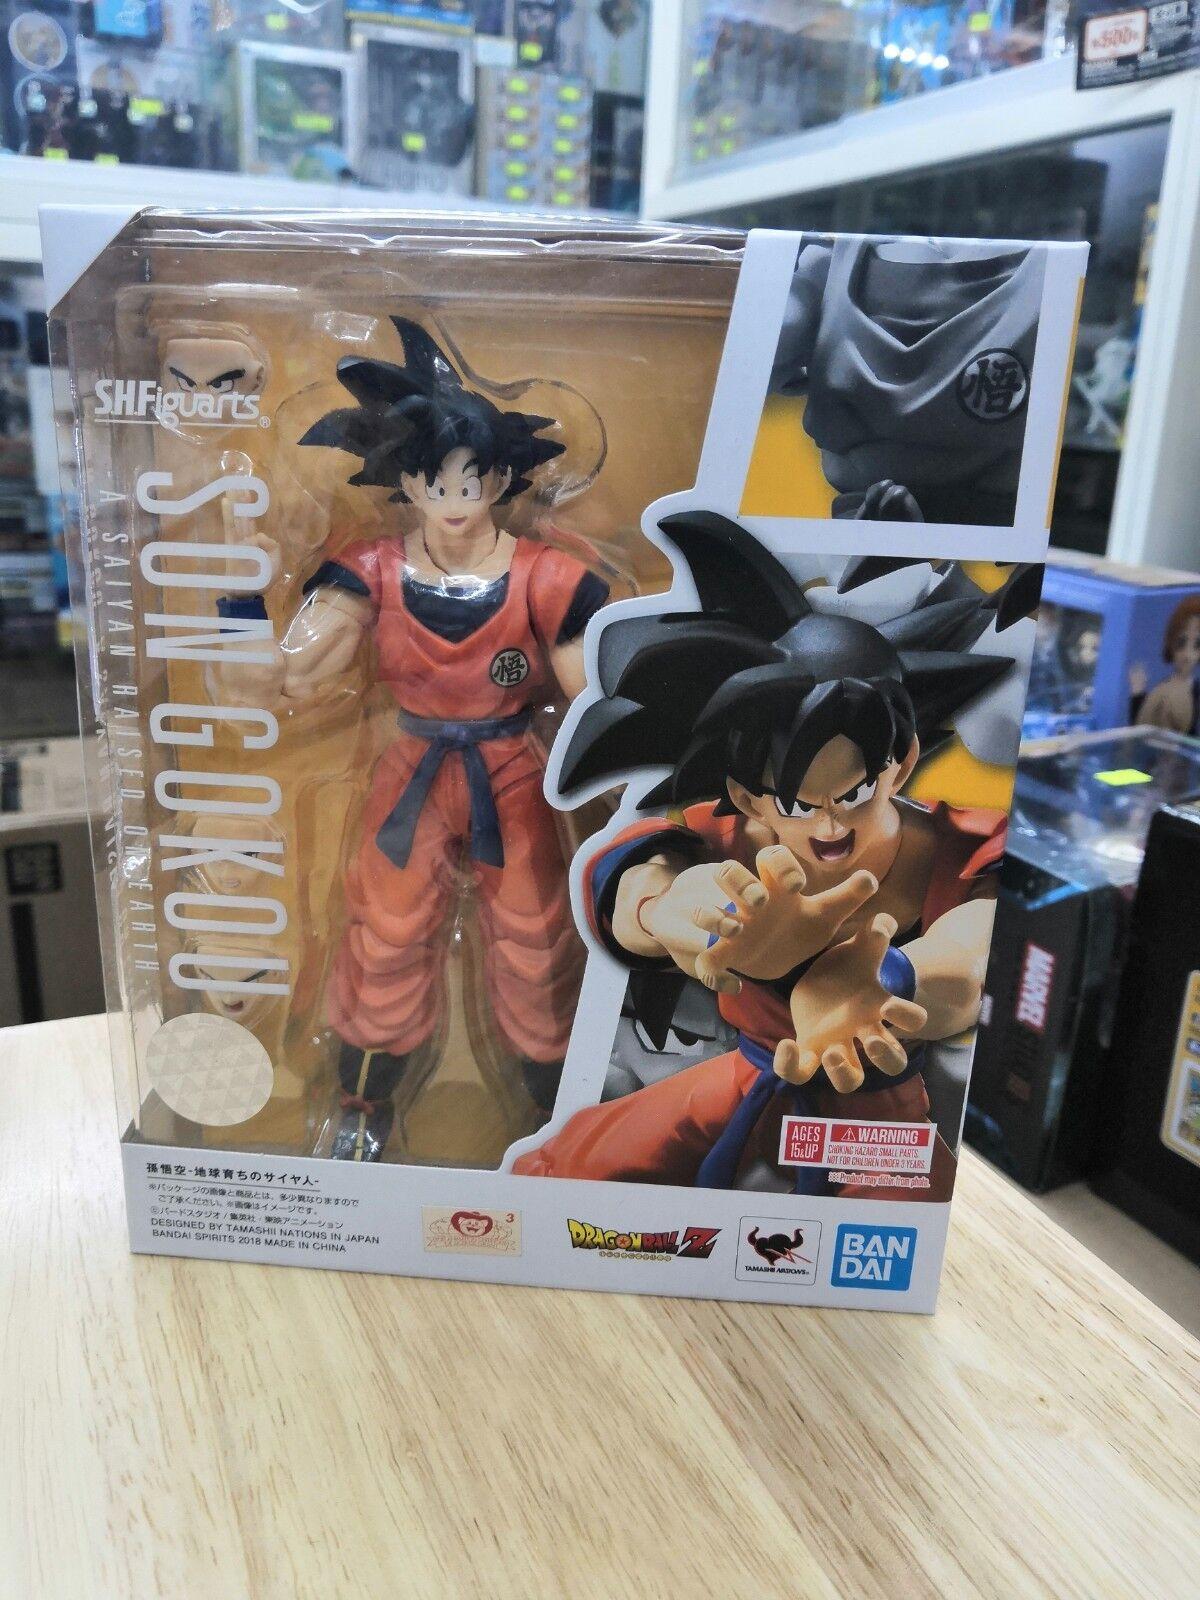 Bandai Bandai Bandai S.H.Figuarts Dragonball Z Son Gokou A Saiyan Raised on Earth Brand New   9f0c7b